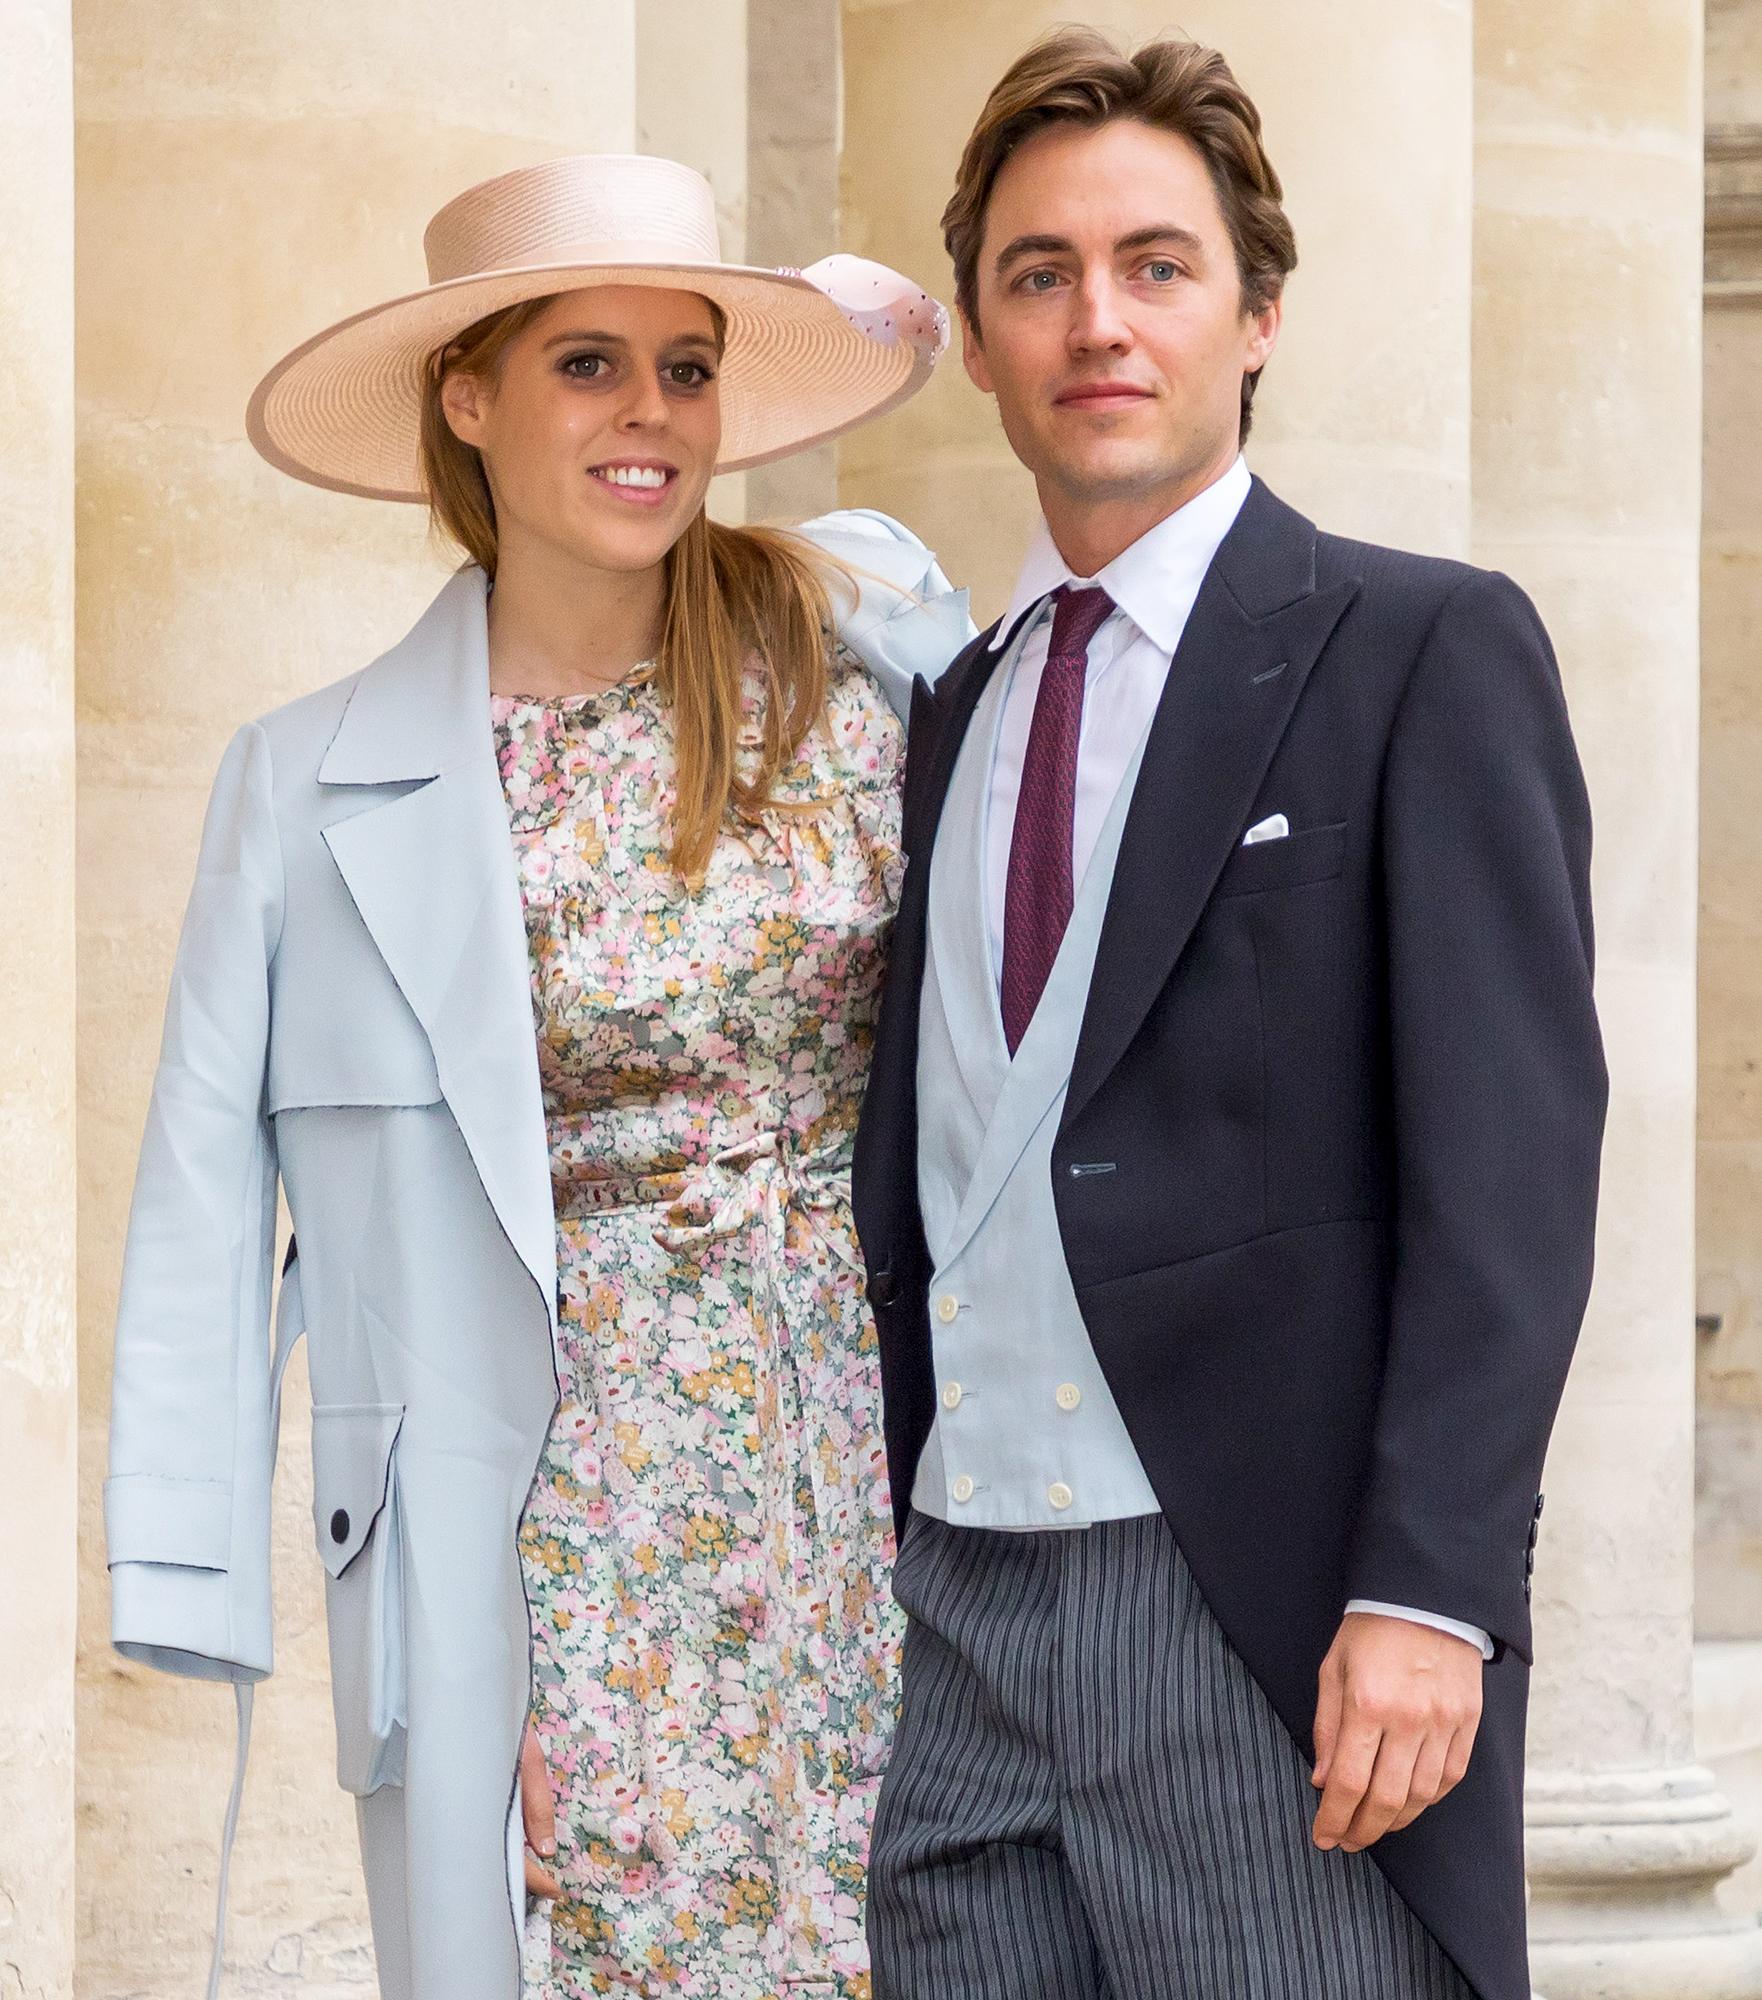 Princess Beatrice Shares 1st Photo From Her Secret Wedding to Edoardo Mapelli Mozzi